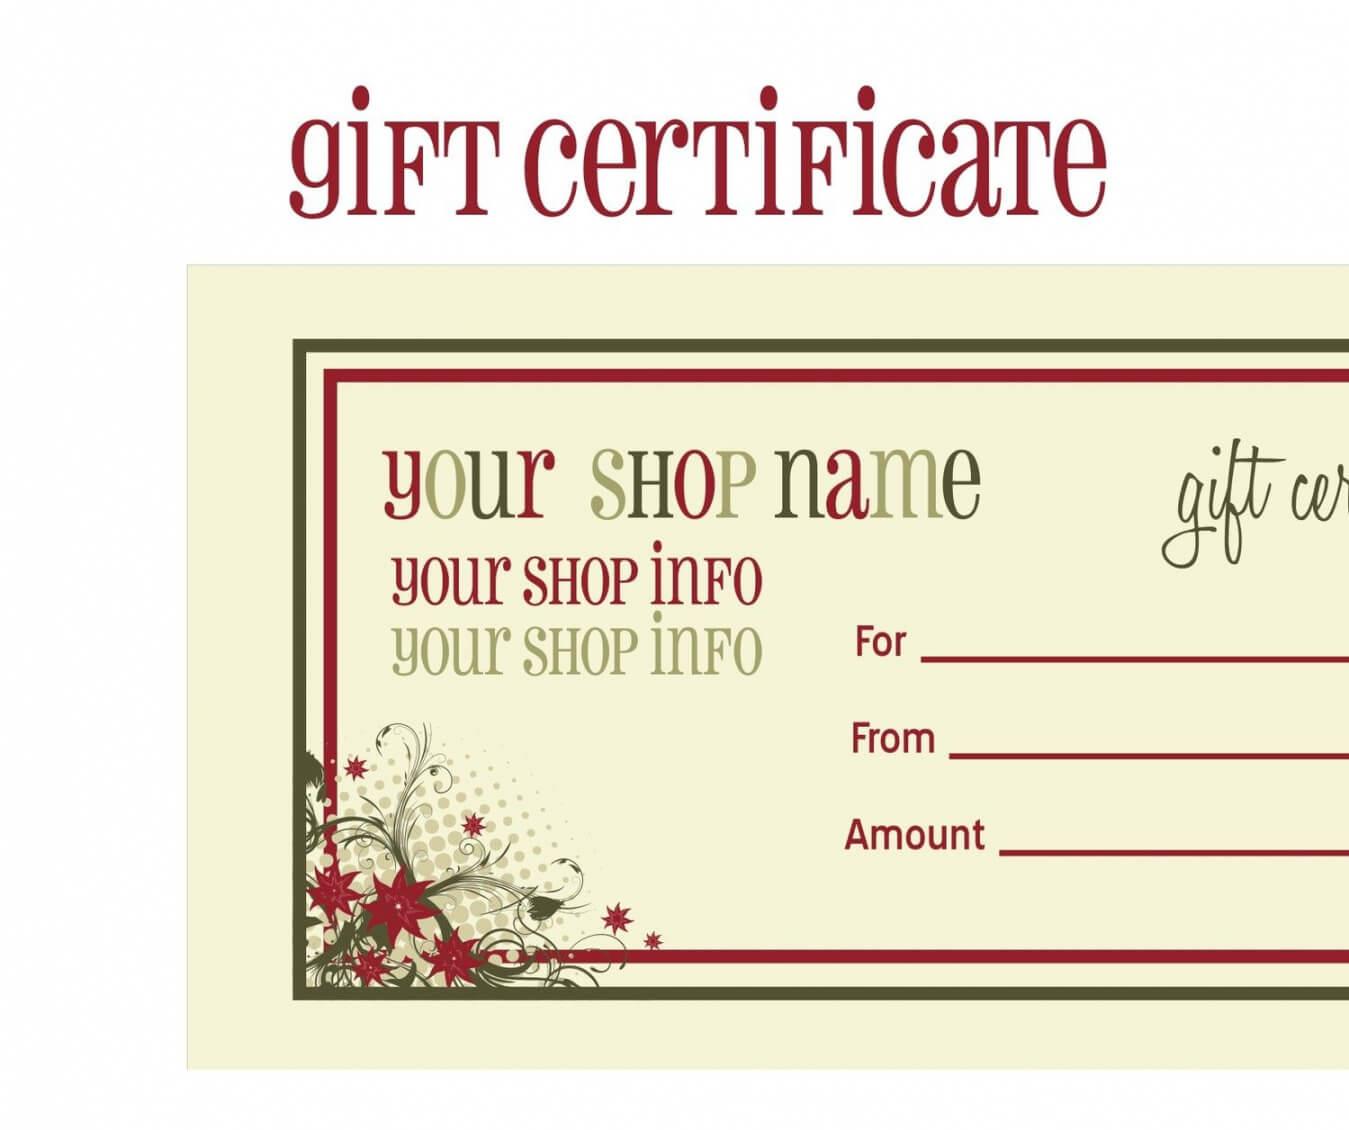 Tattoo Gift Certificate Template Free | Emetonlineblog in Tattoo Gift Certificate Template